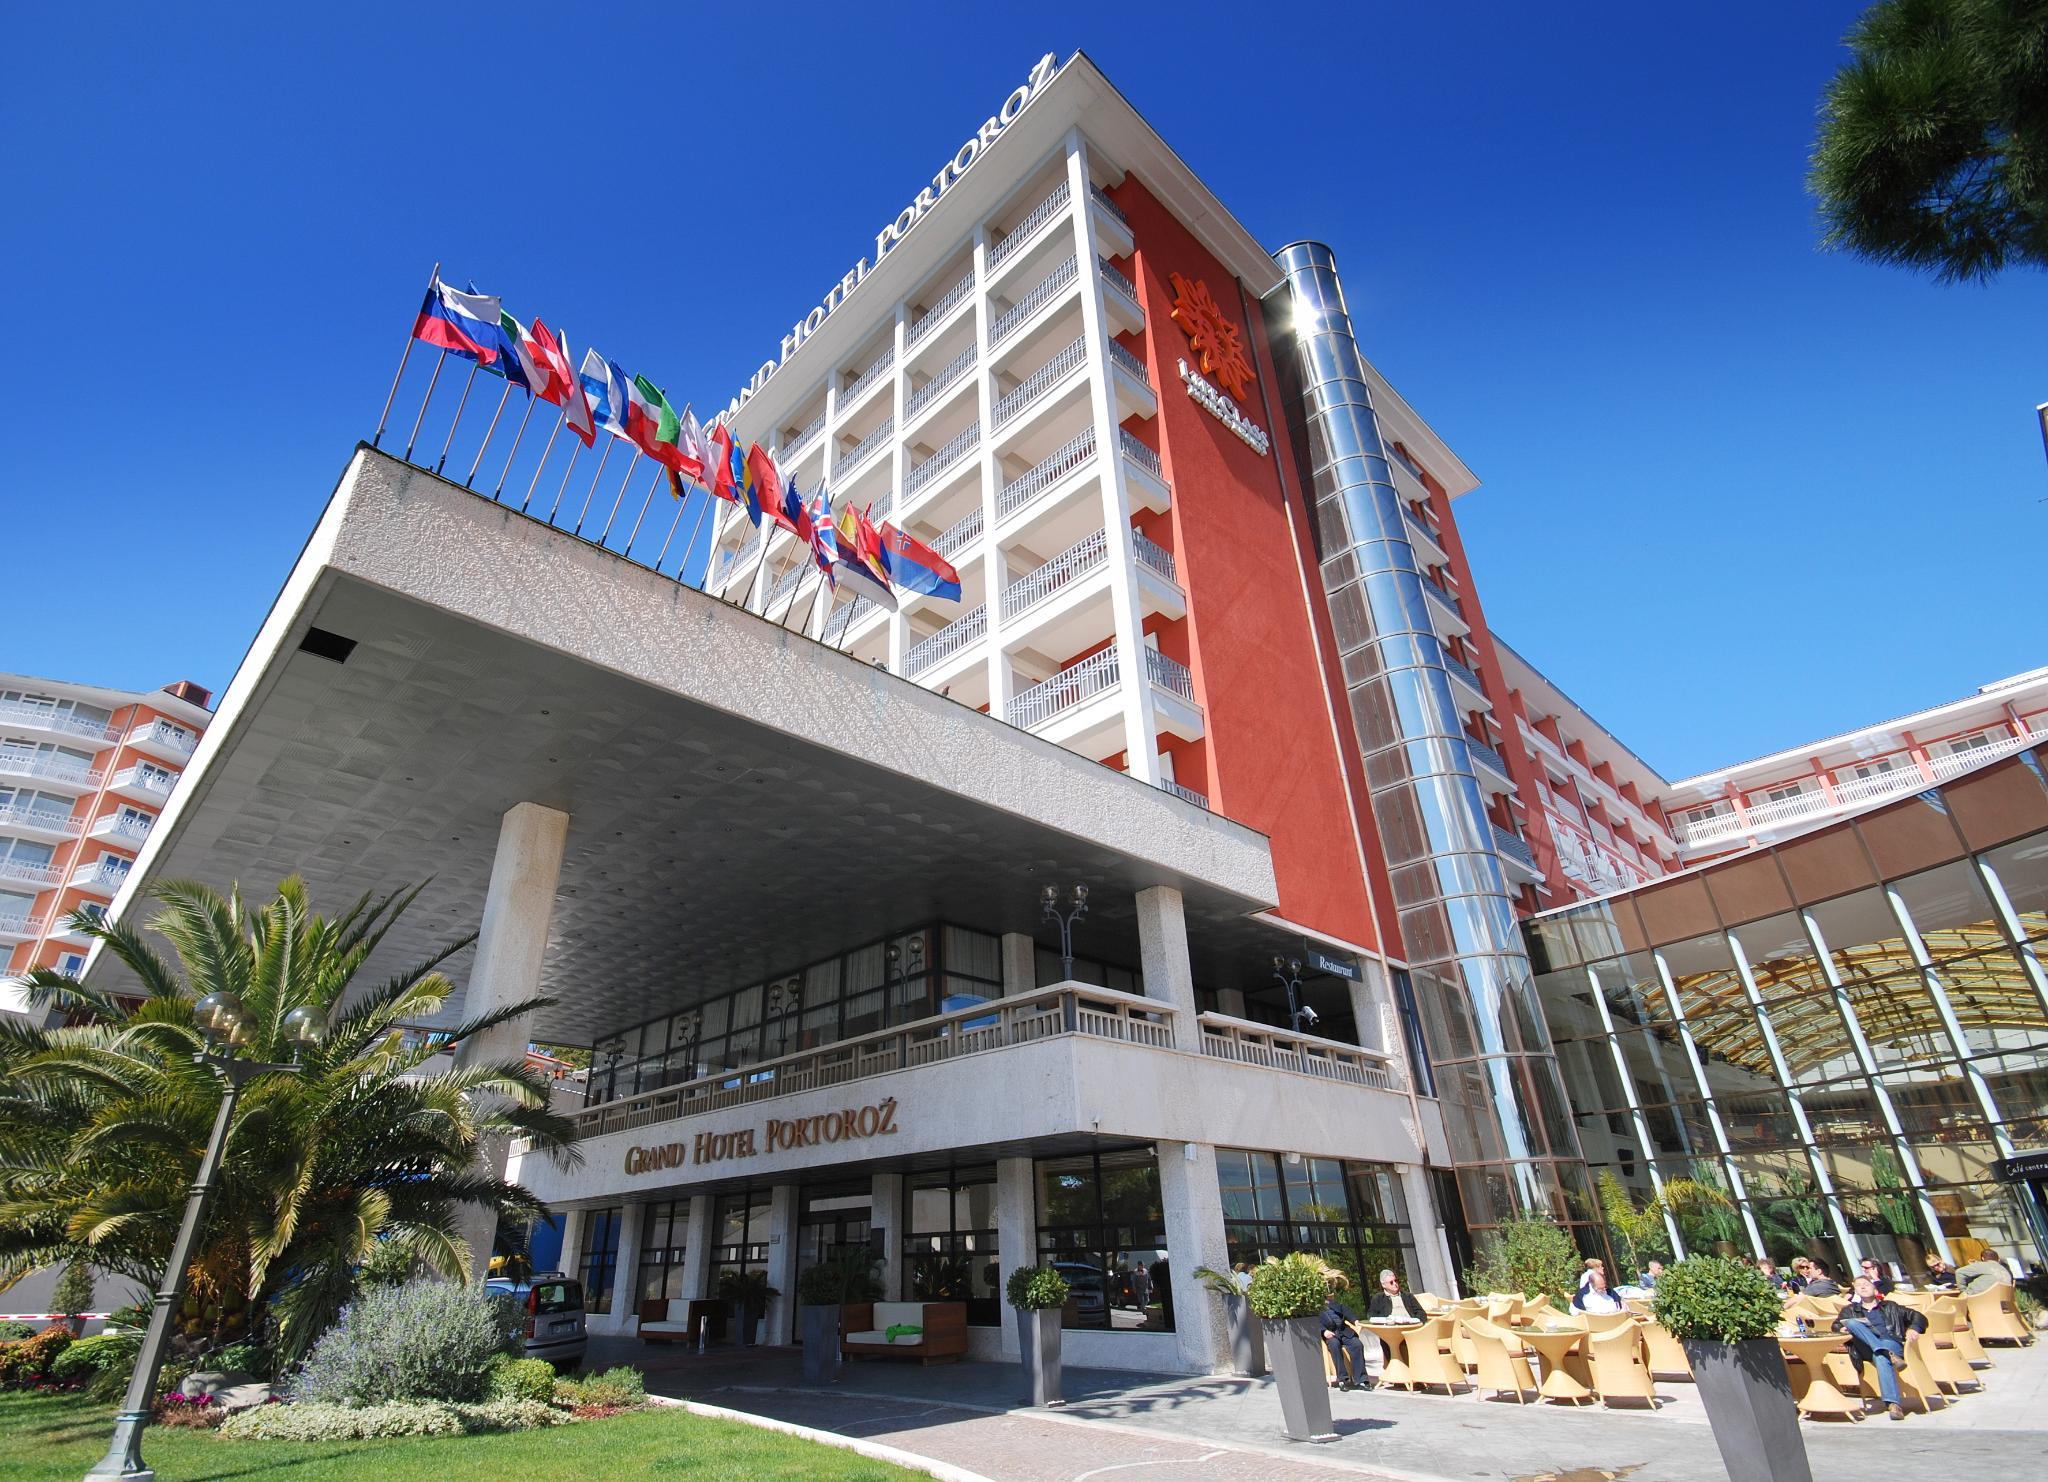 Grand Hotel Portoroz In Portoroz Adriatic Coast Karst Slovenia Portoroz Adriatic Coast Karst Hotel Booking